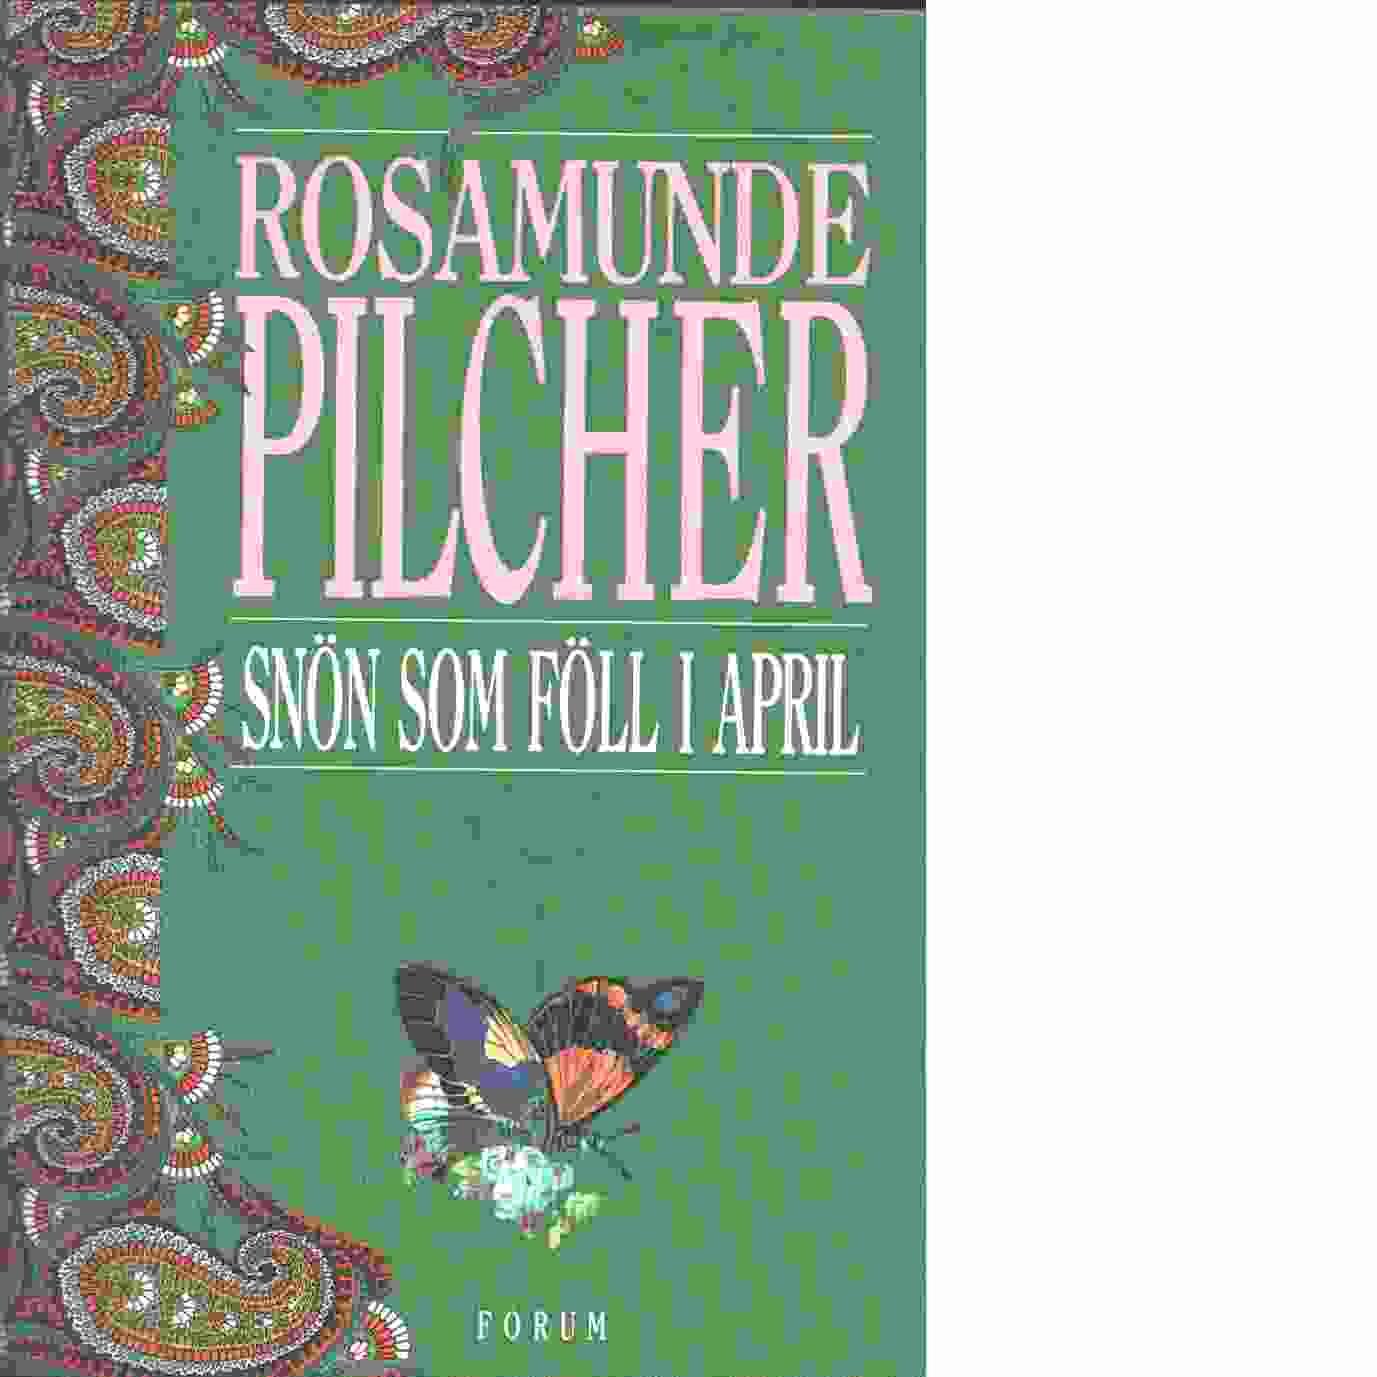 Snön som föll i april - Pilcher, Rosamunde